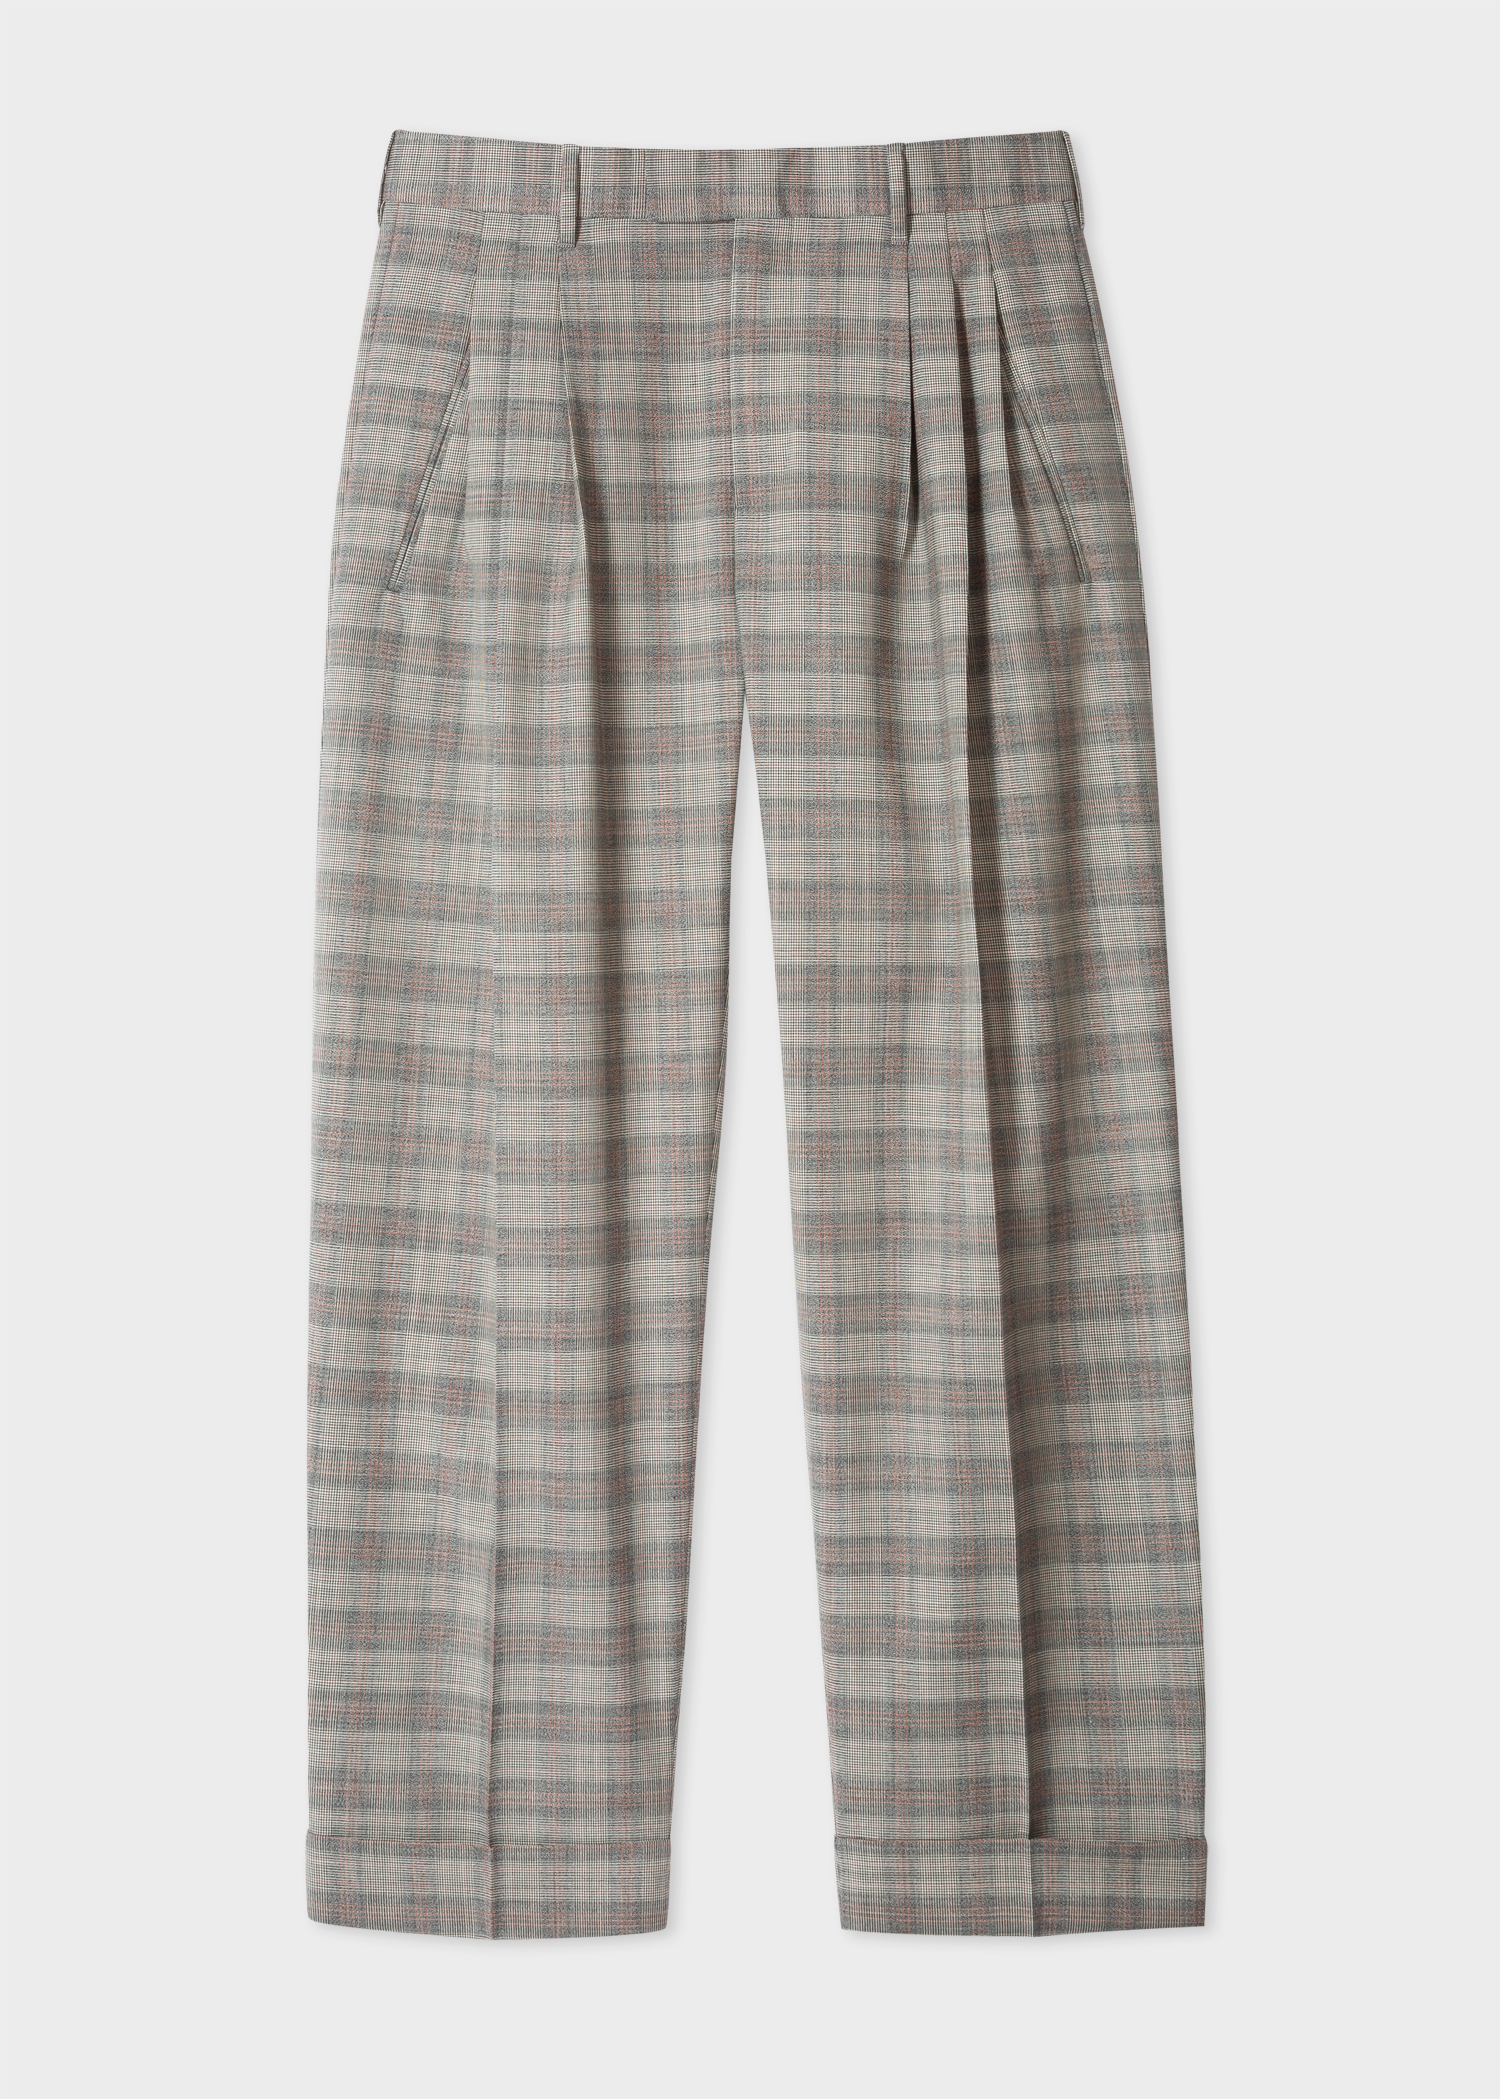 Men S Wide Leg Grey And Orange Glen Plaid Pleated Wool Trousers